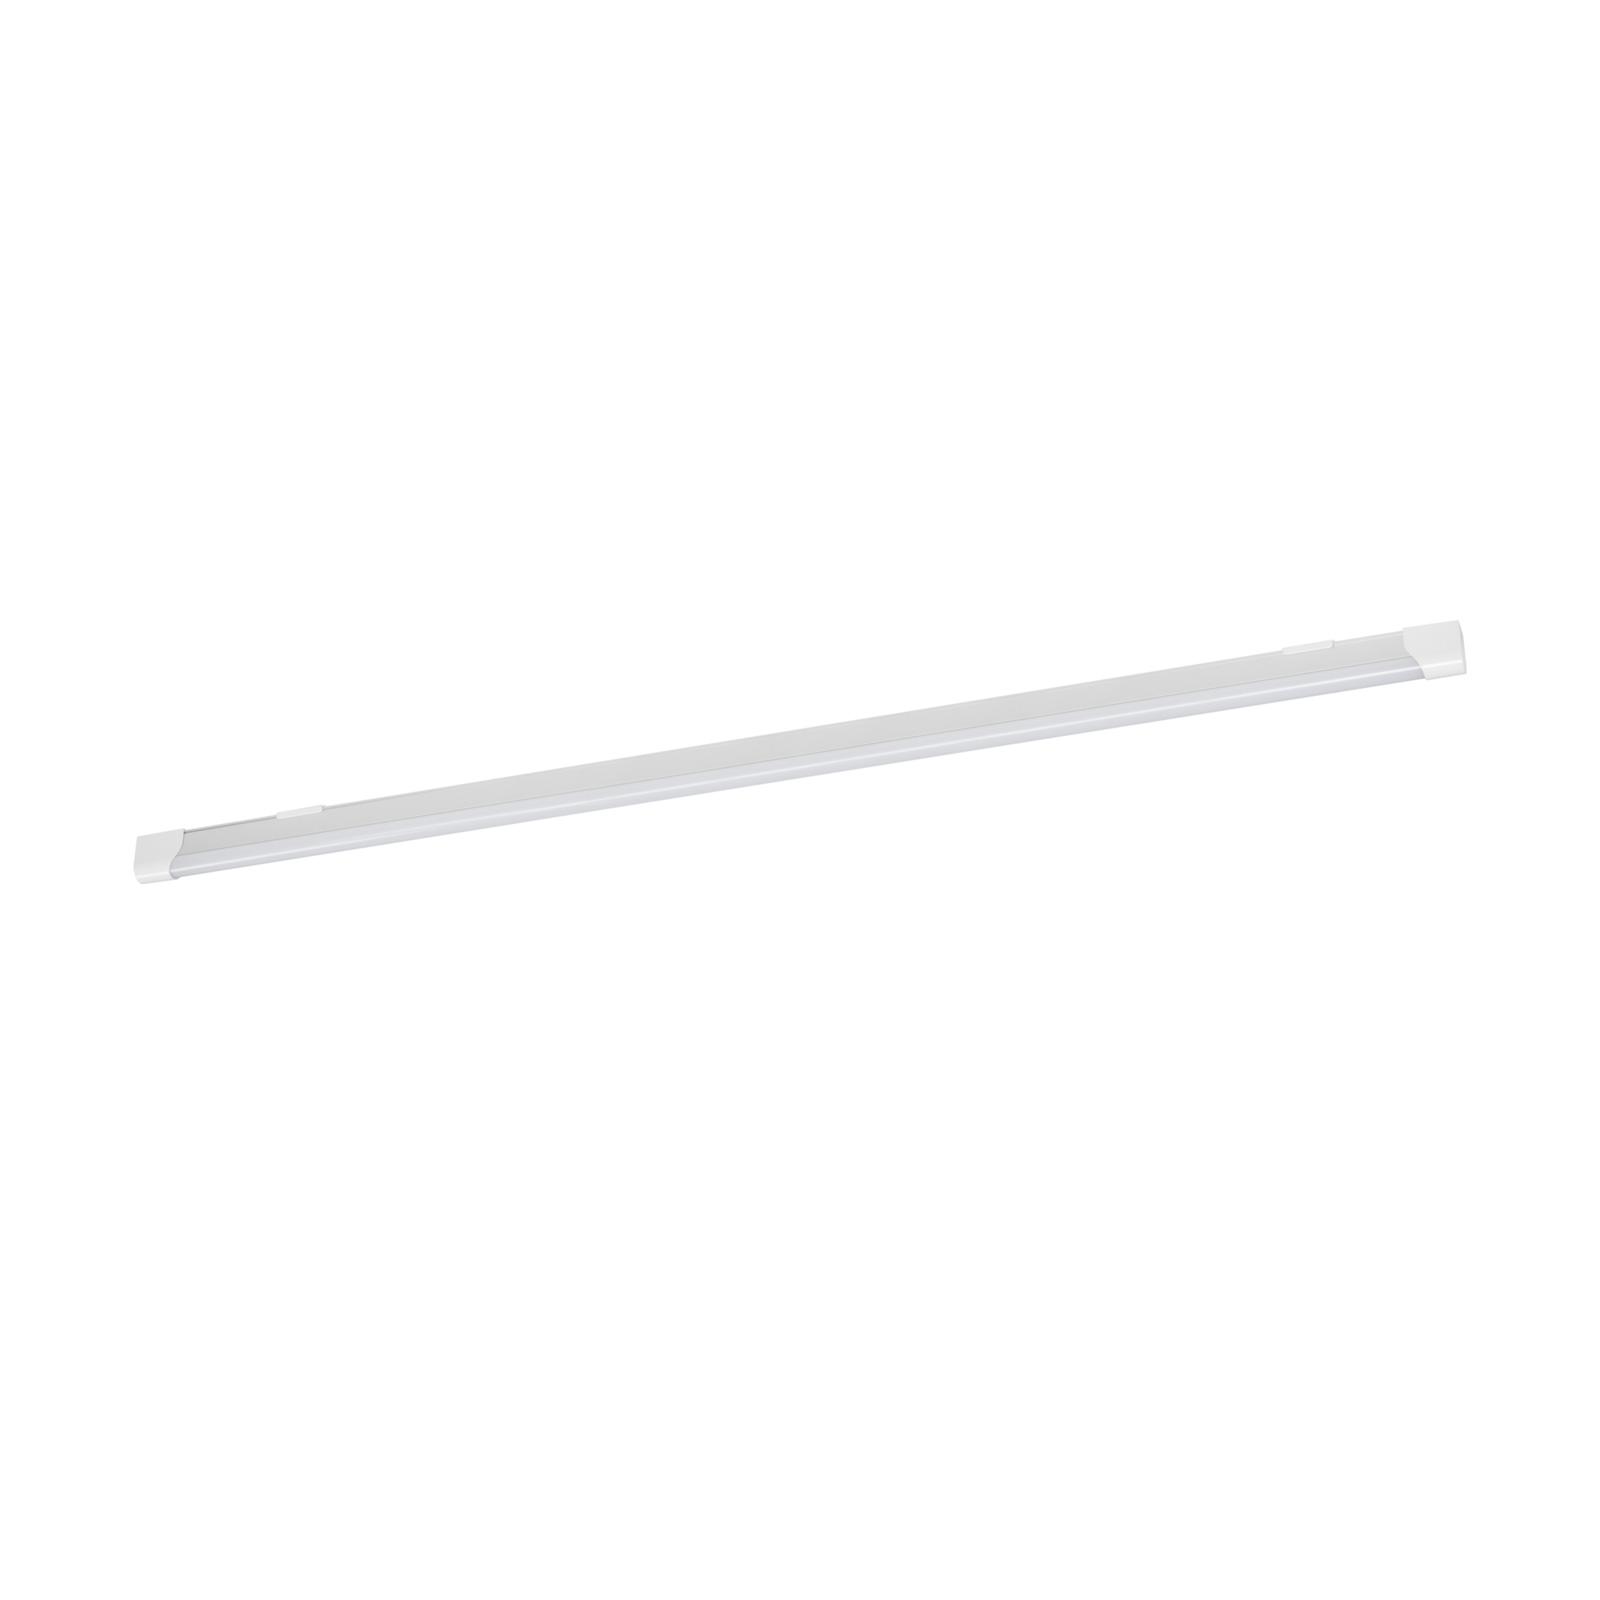 LEDVANCE Value Batten LED lichtband 120 cm